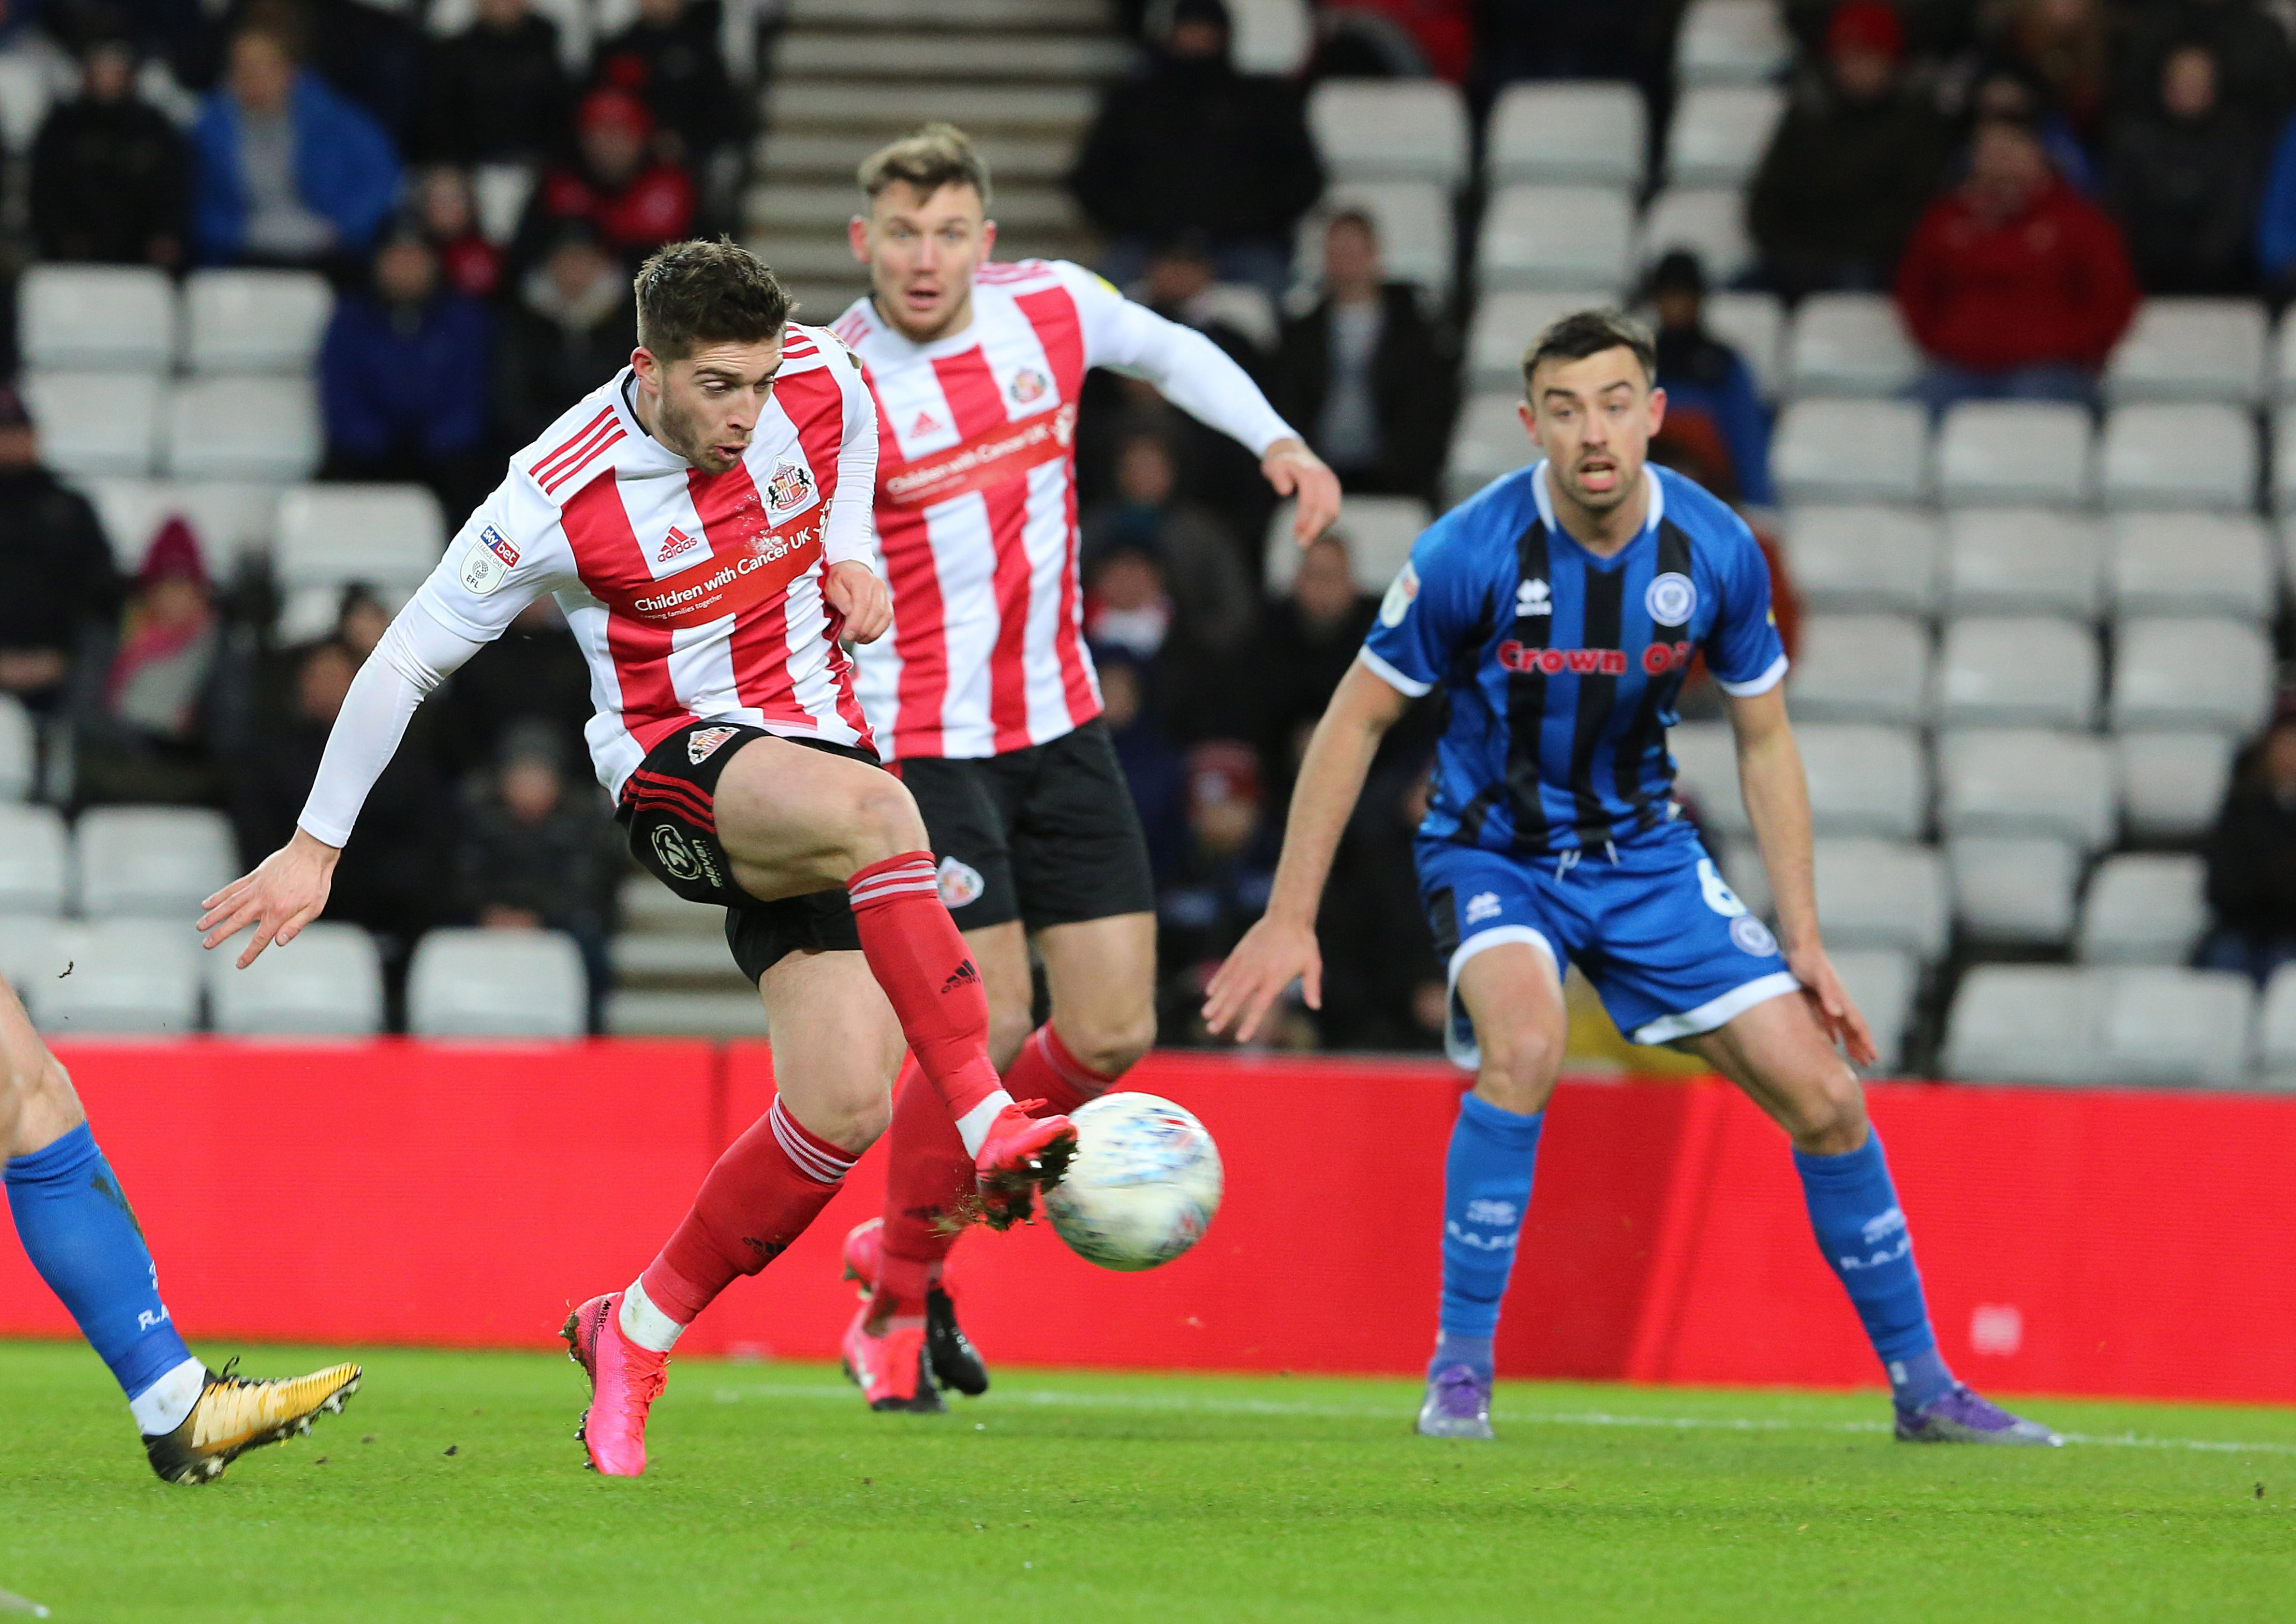 Gooch Rochdale goal Sunderland blog